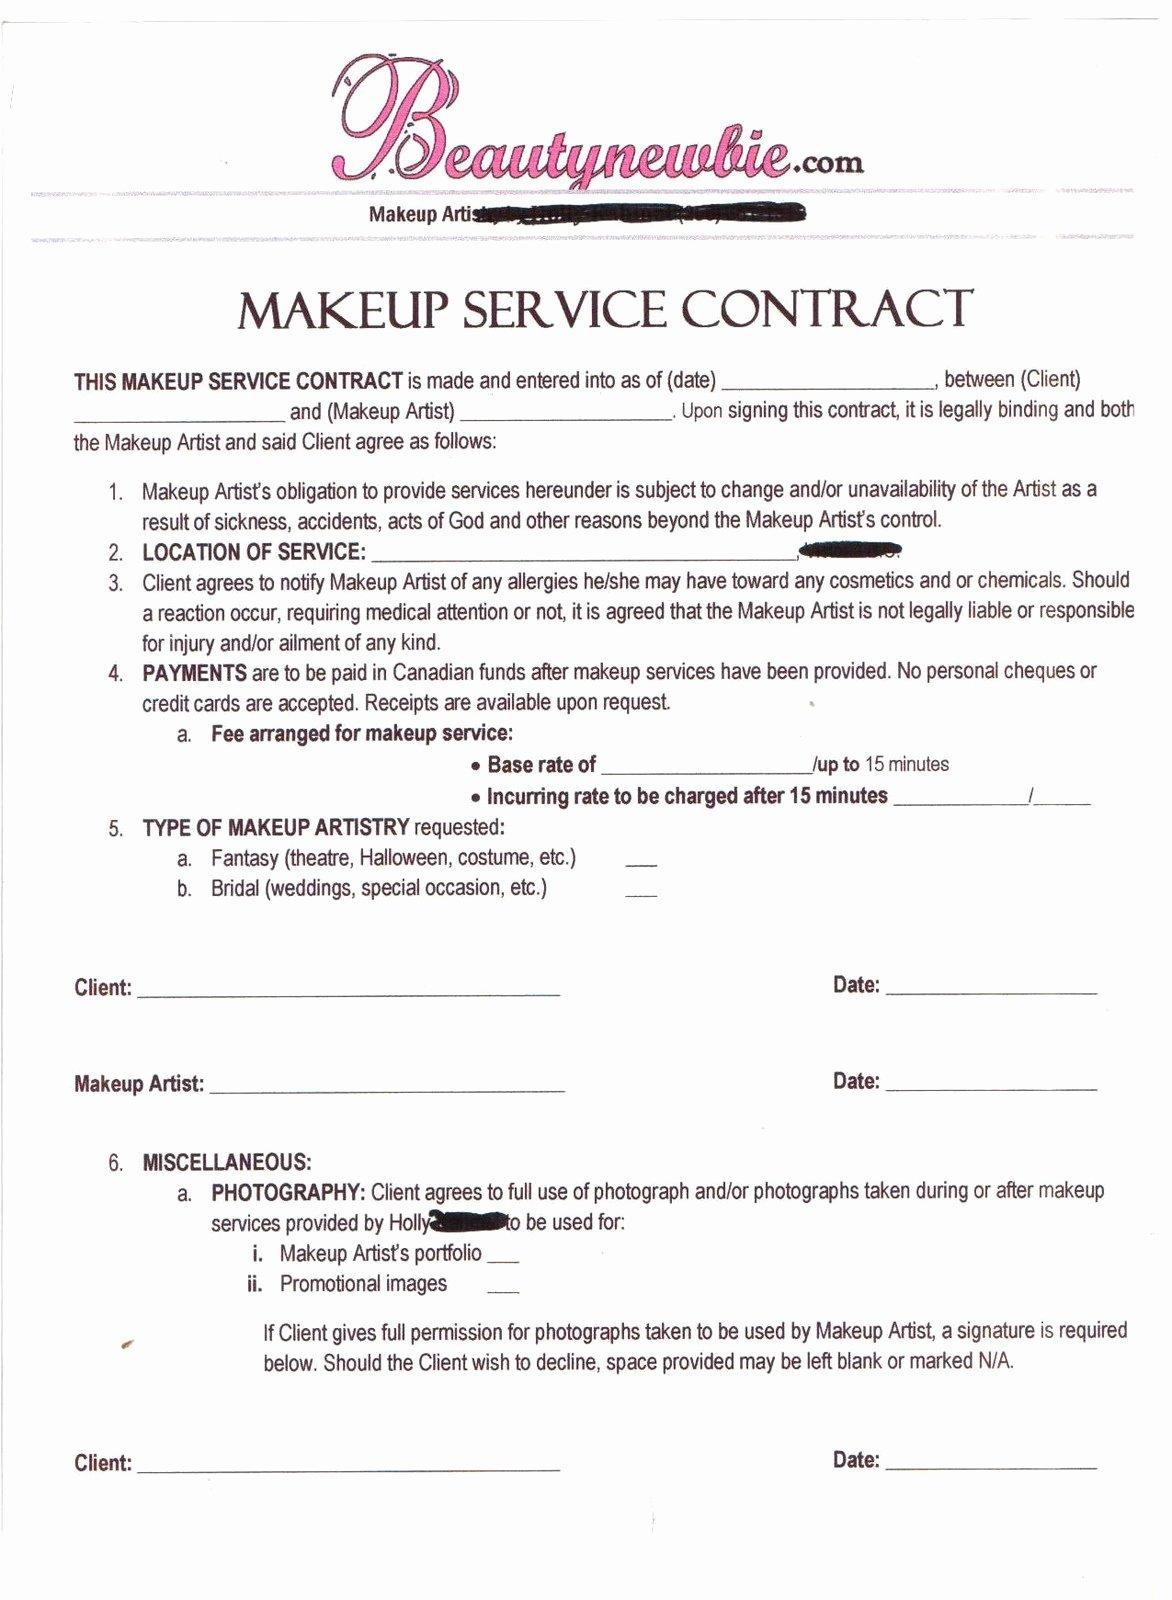 Freelance Makeup Artist Contract Templates Unique Freelance Makeup Artist Contract Template